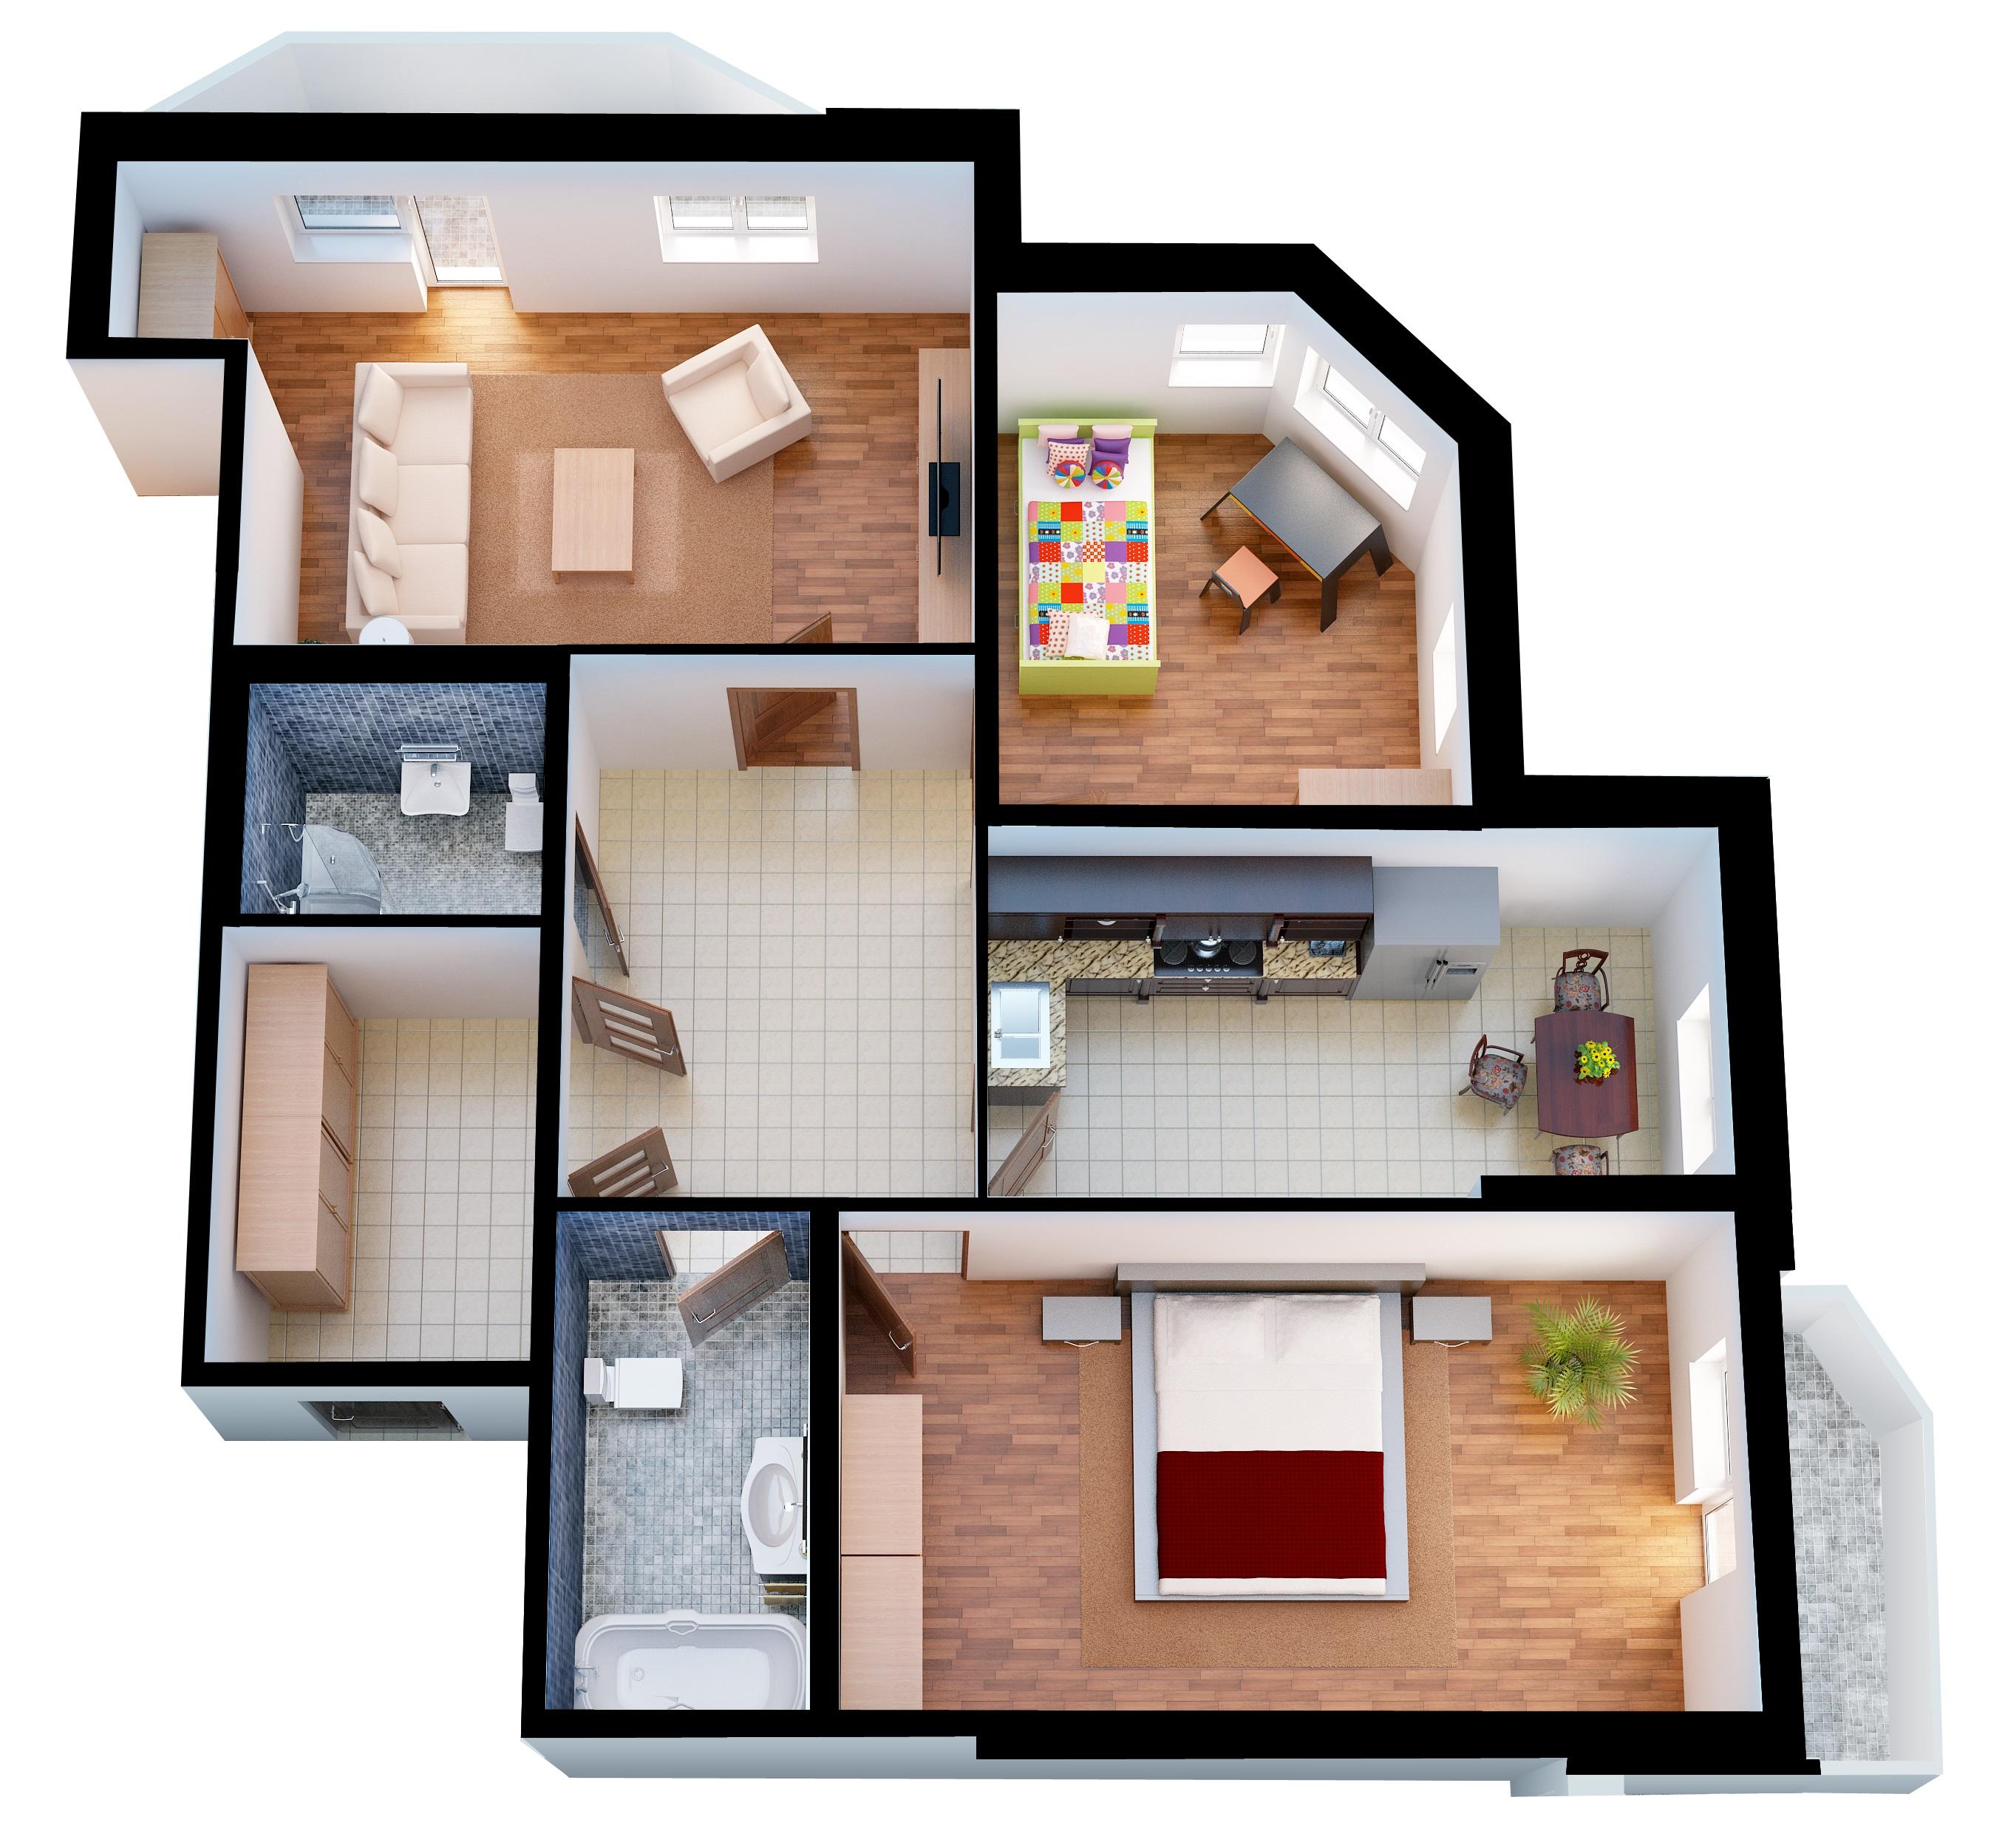 Преимущества трехкомнатных квартир от ССК